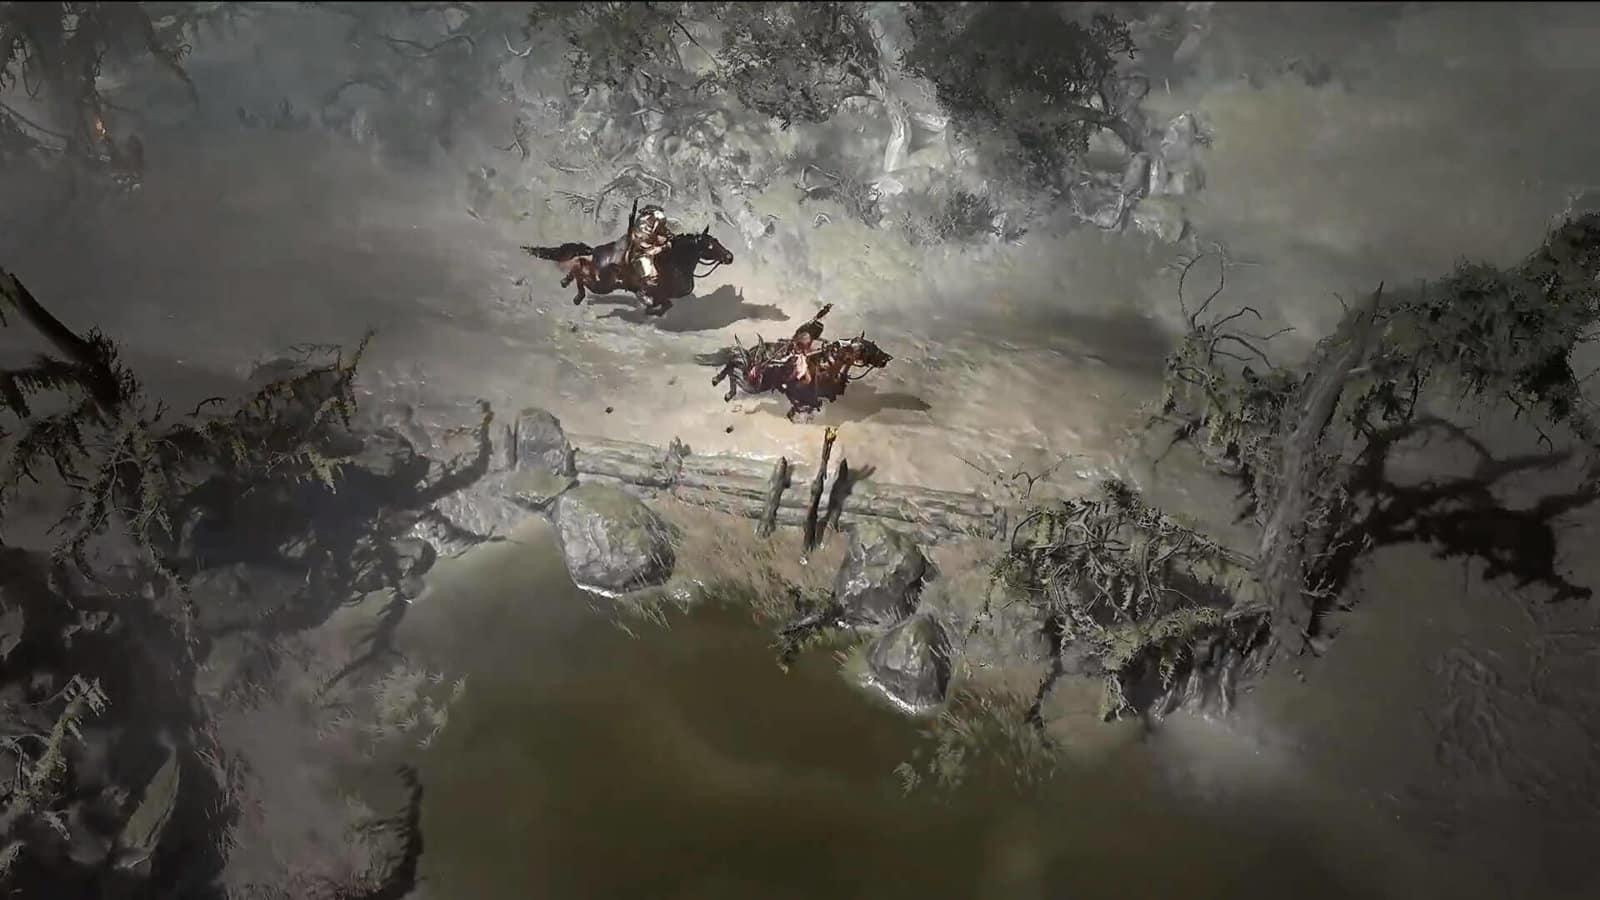 Diablo IV - Cavalcature screenshot